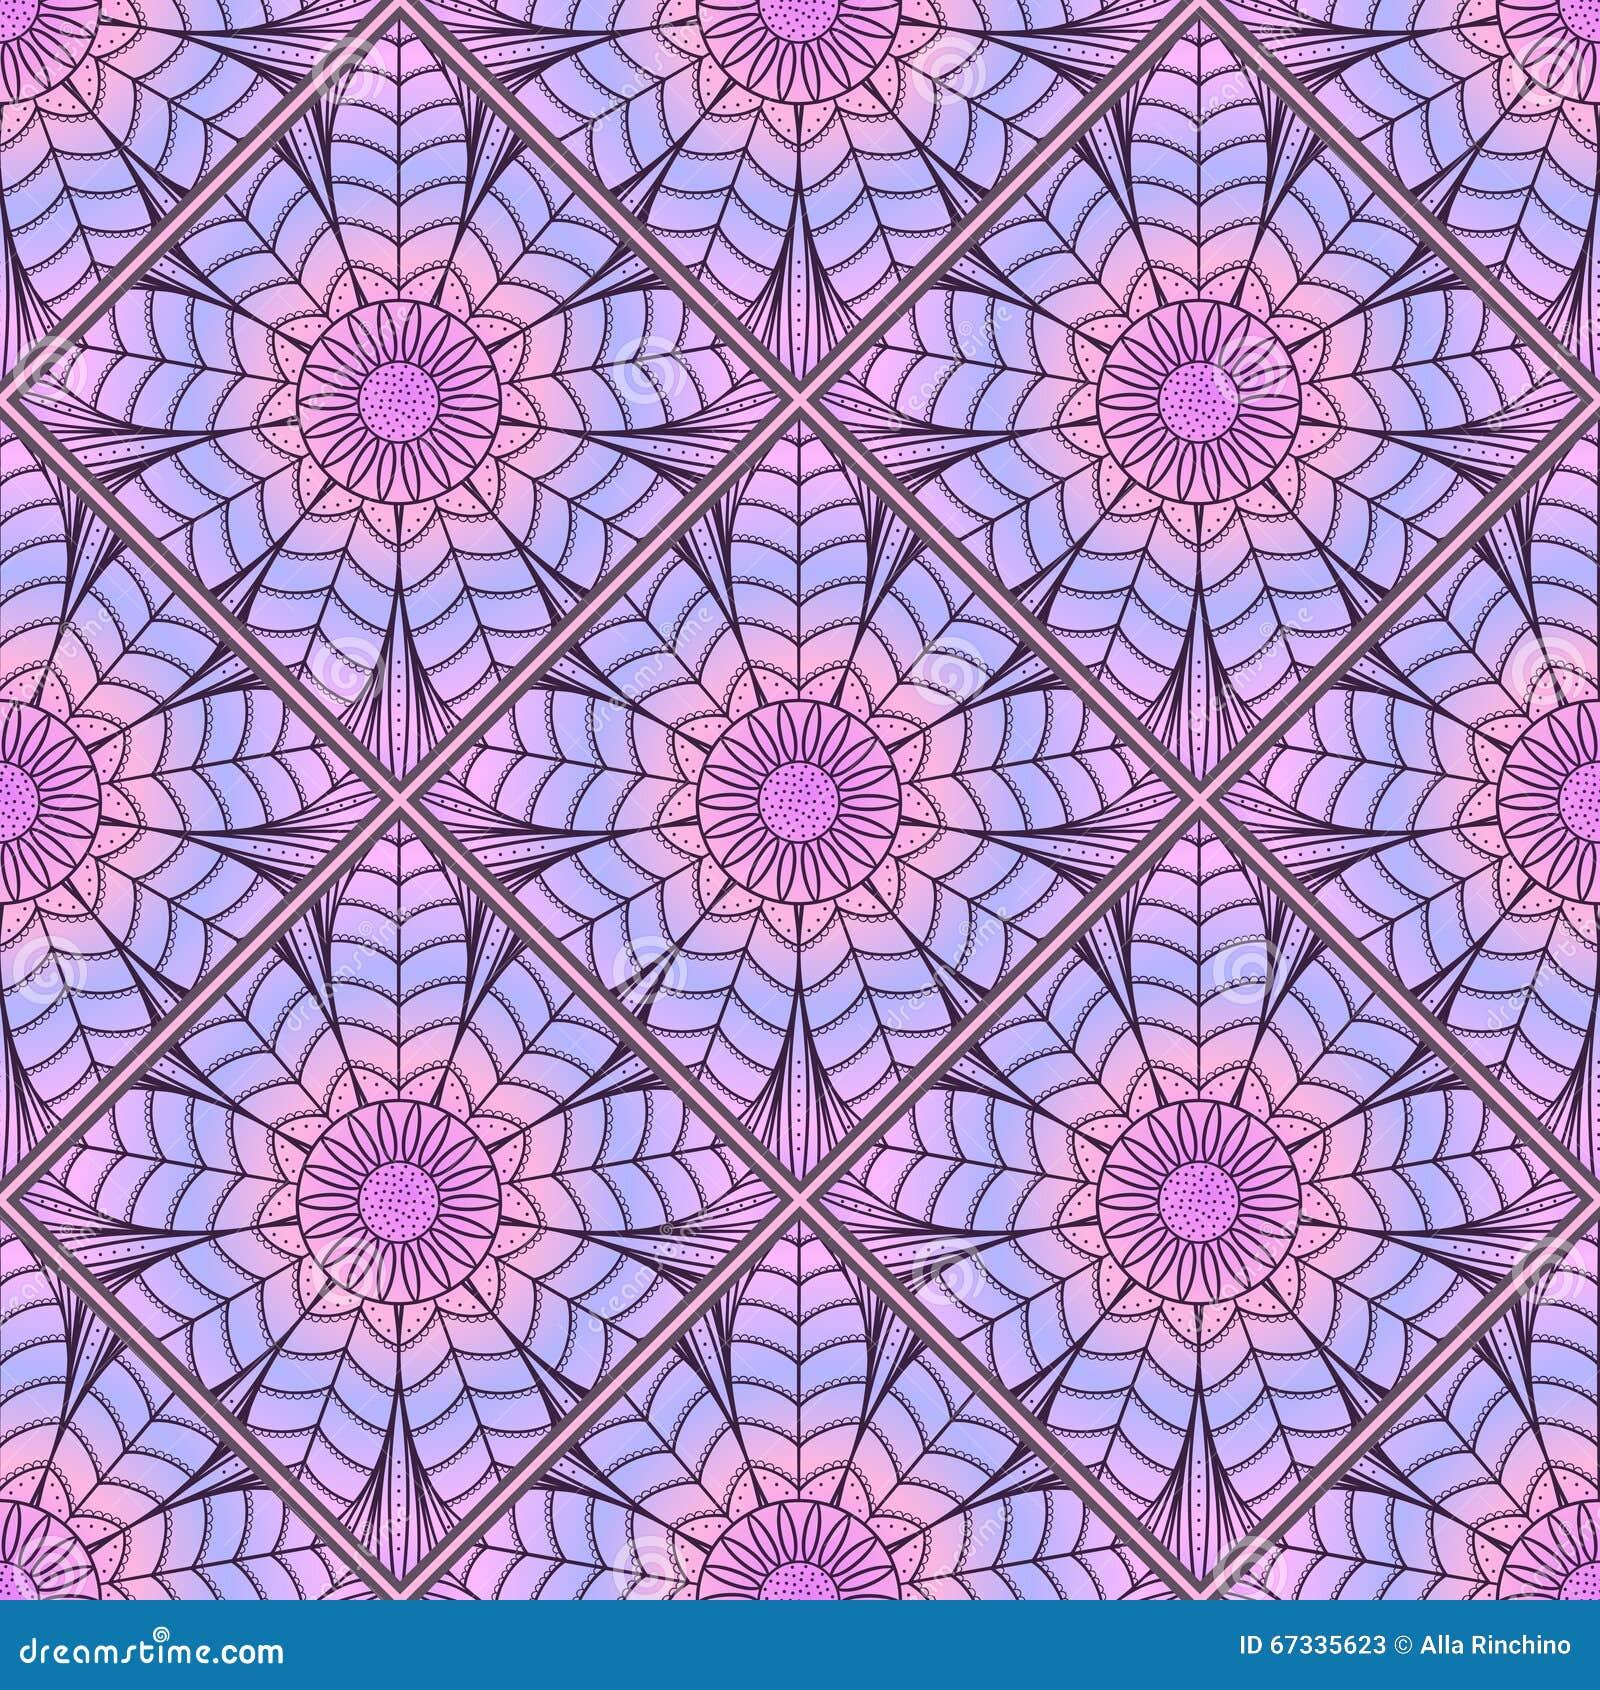 Mosaic Pattern Of Colored Mandala2 Stock Vector Illustration Of